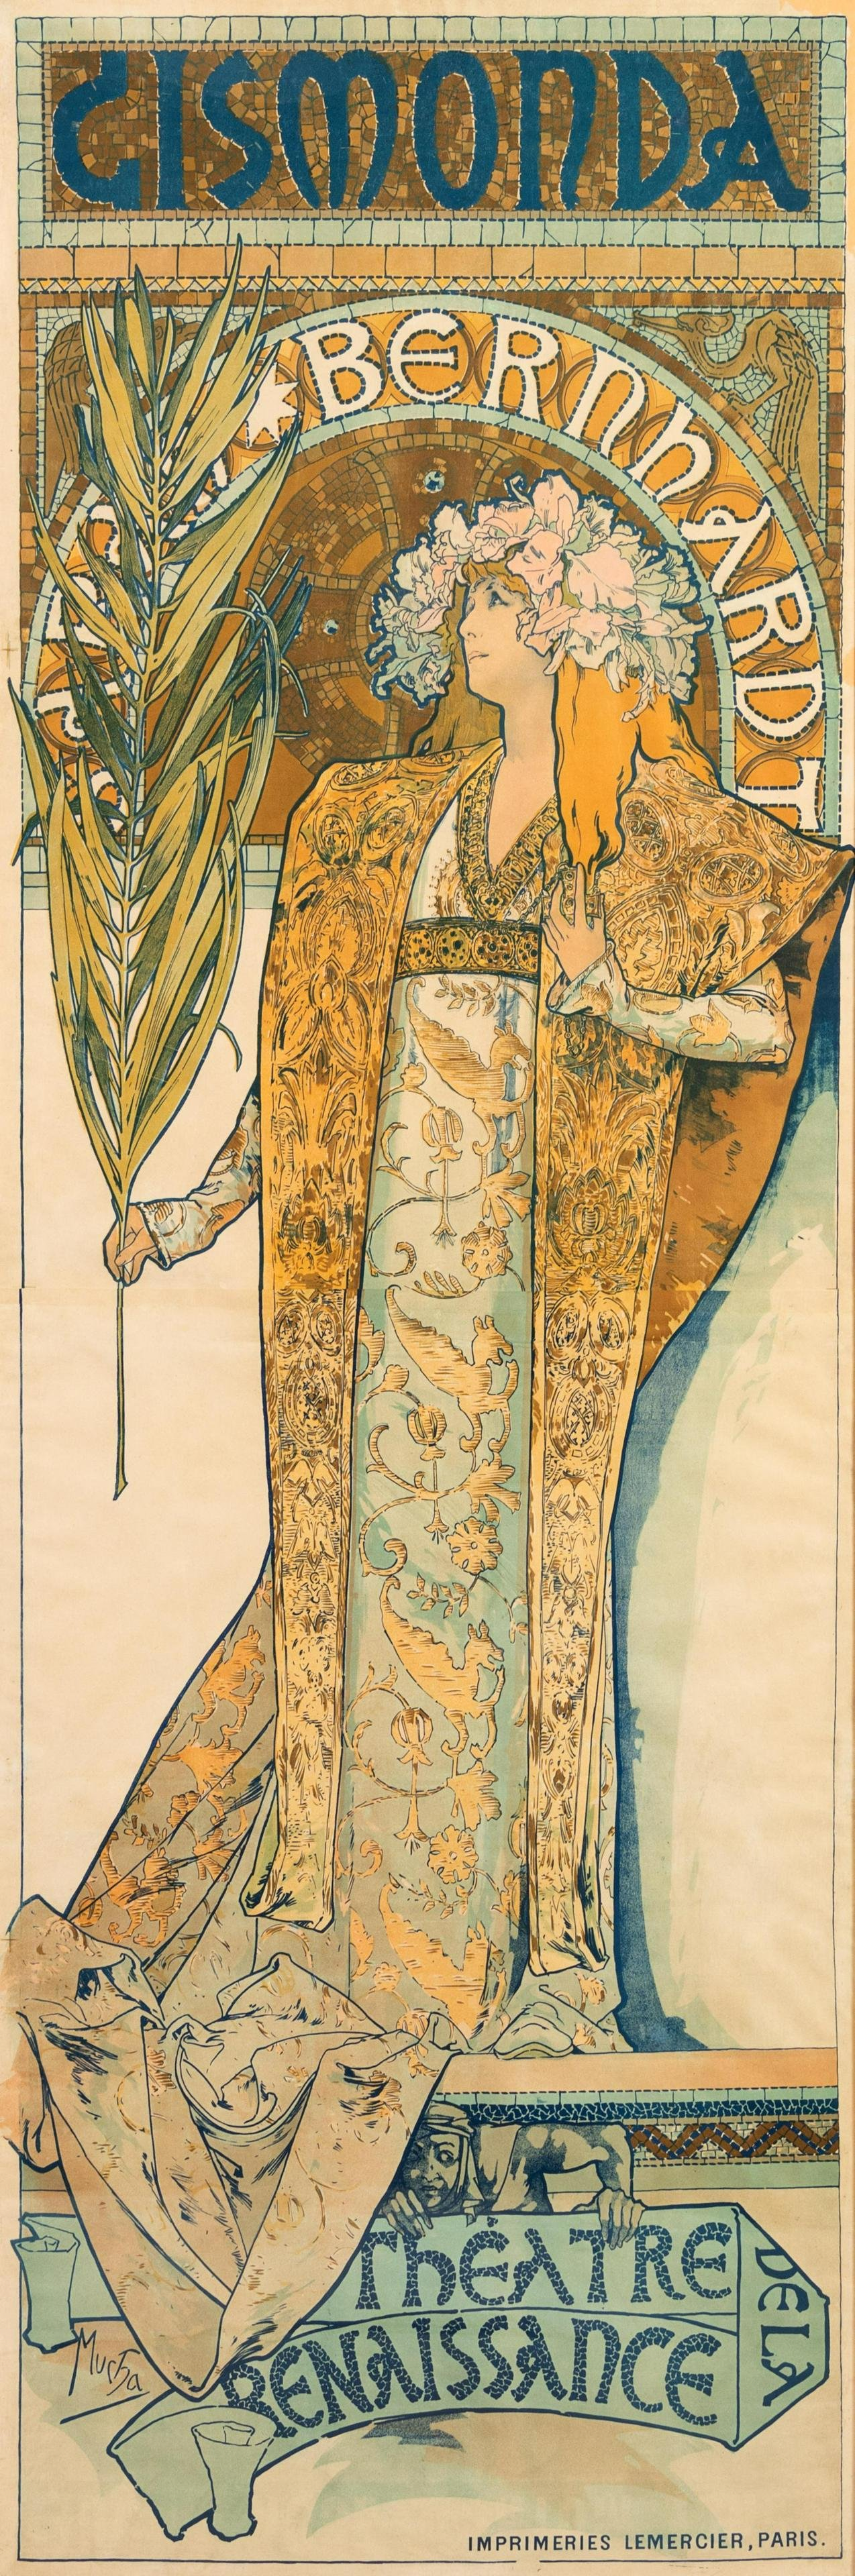 Alphonse Mucha (Czech, 1860-1939) Gismonda, Sara